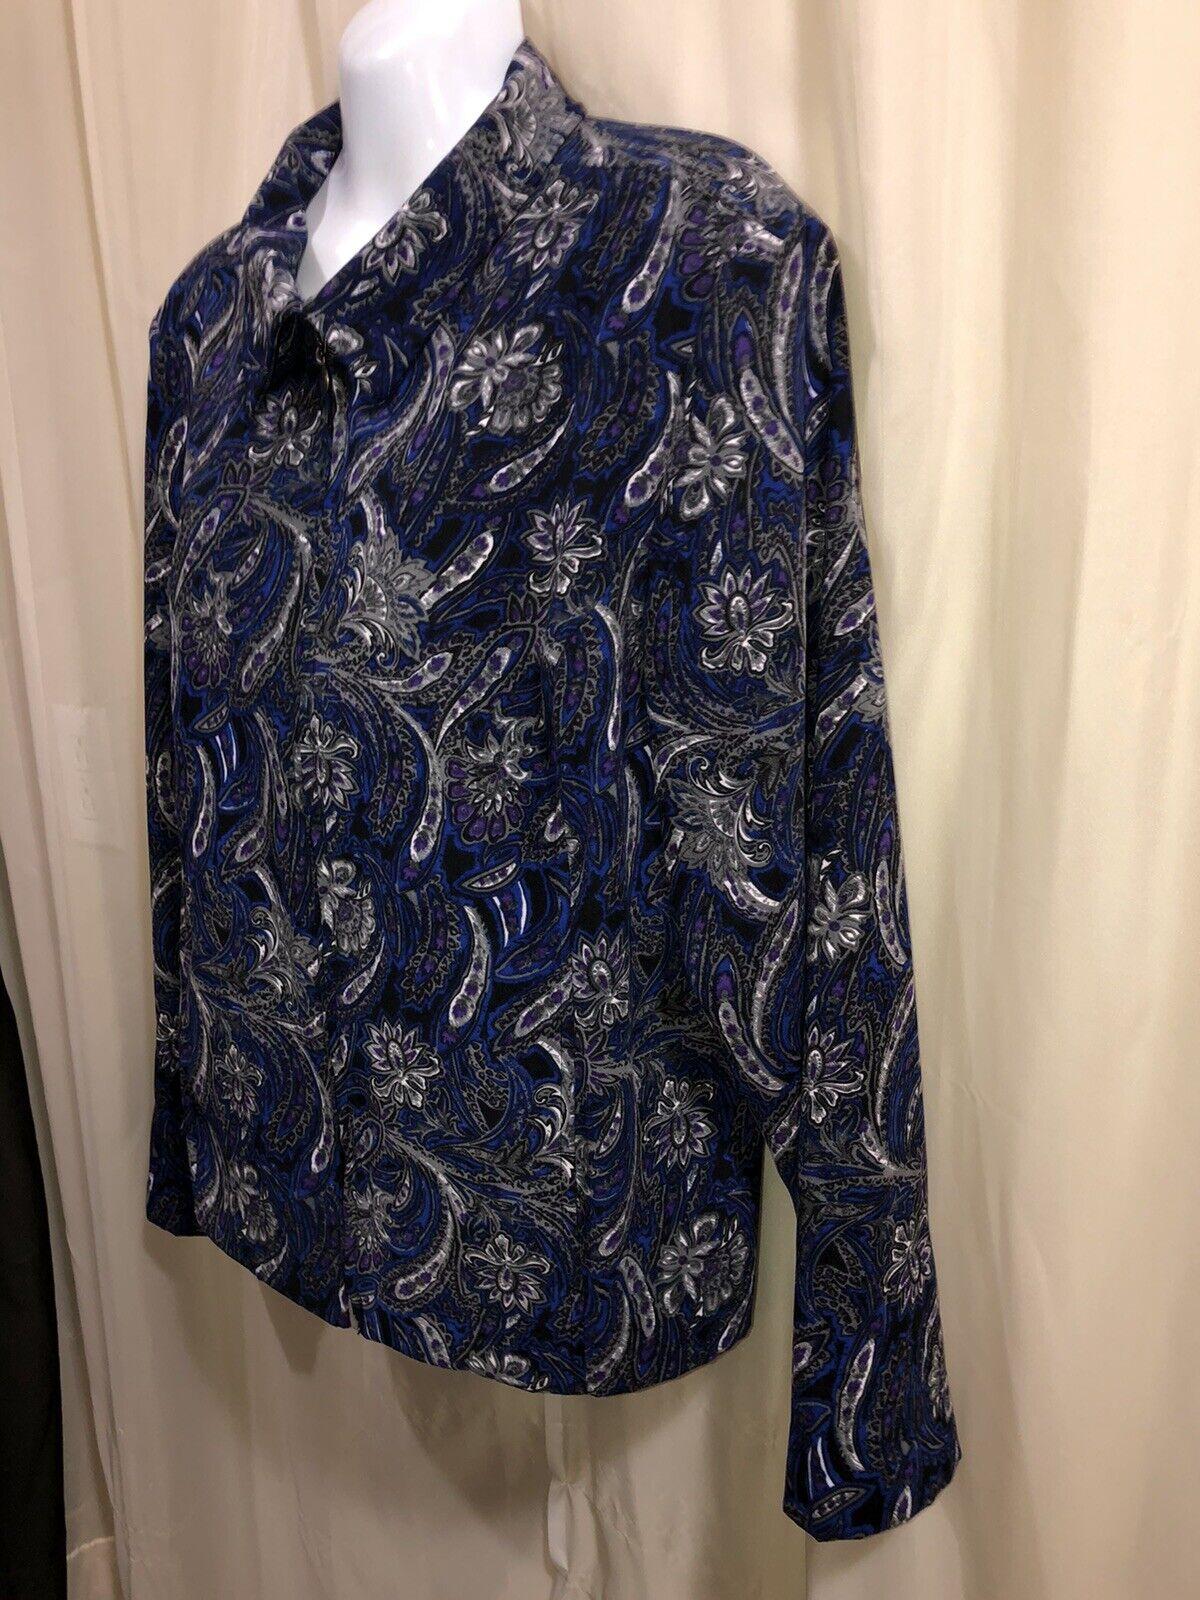 CHRISTOPHER & BANKS Paisley Unlined Jacket Zip Fr… - image 3